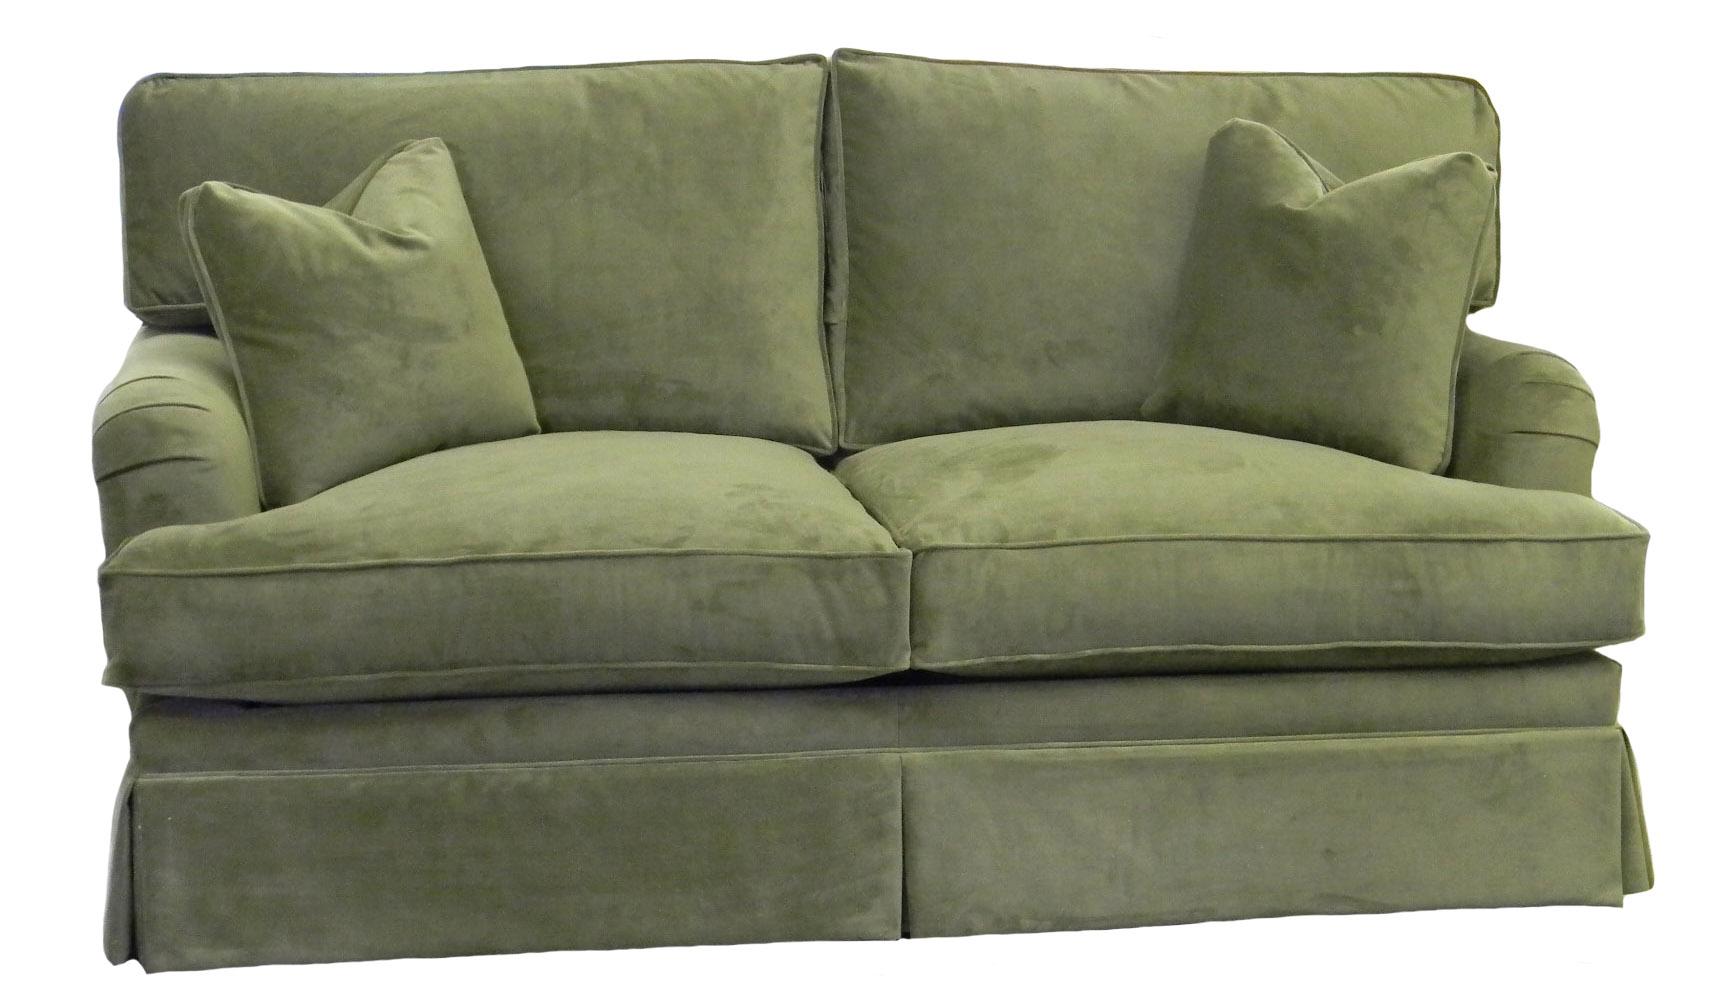 English Full Sleeper Sofa